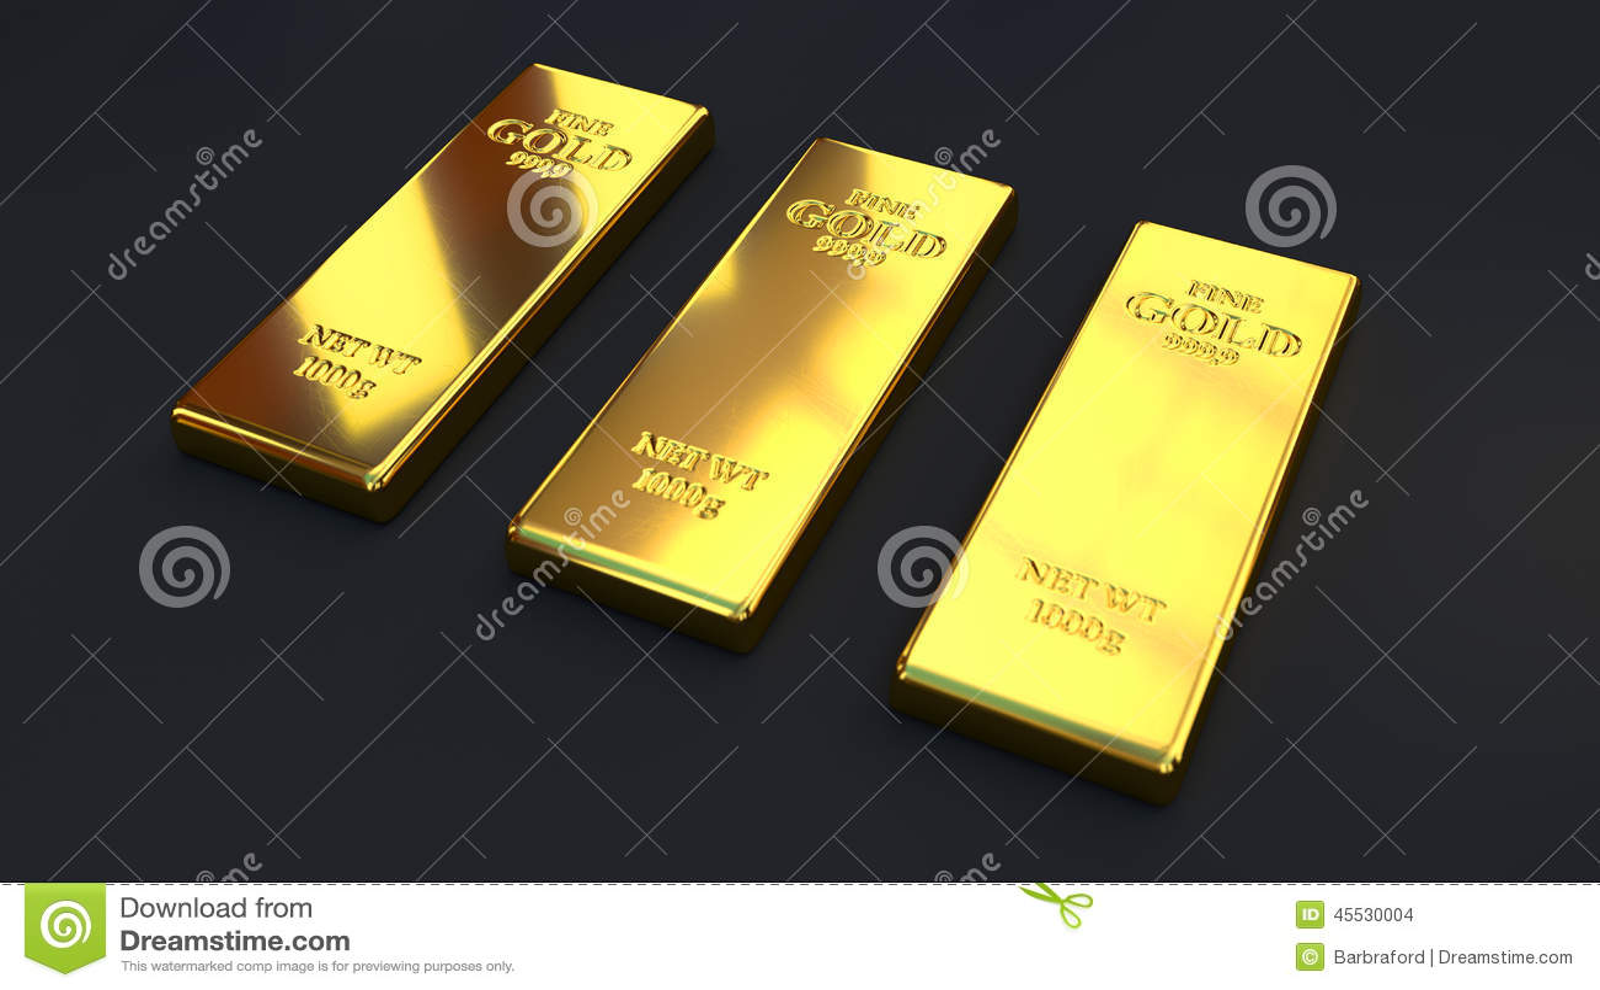 gold bar black background - photo #12